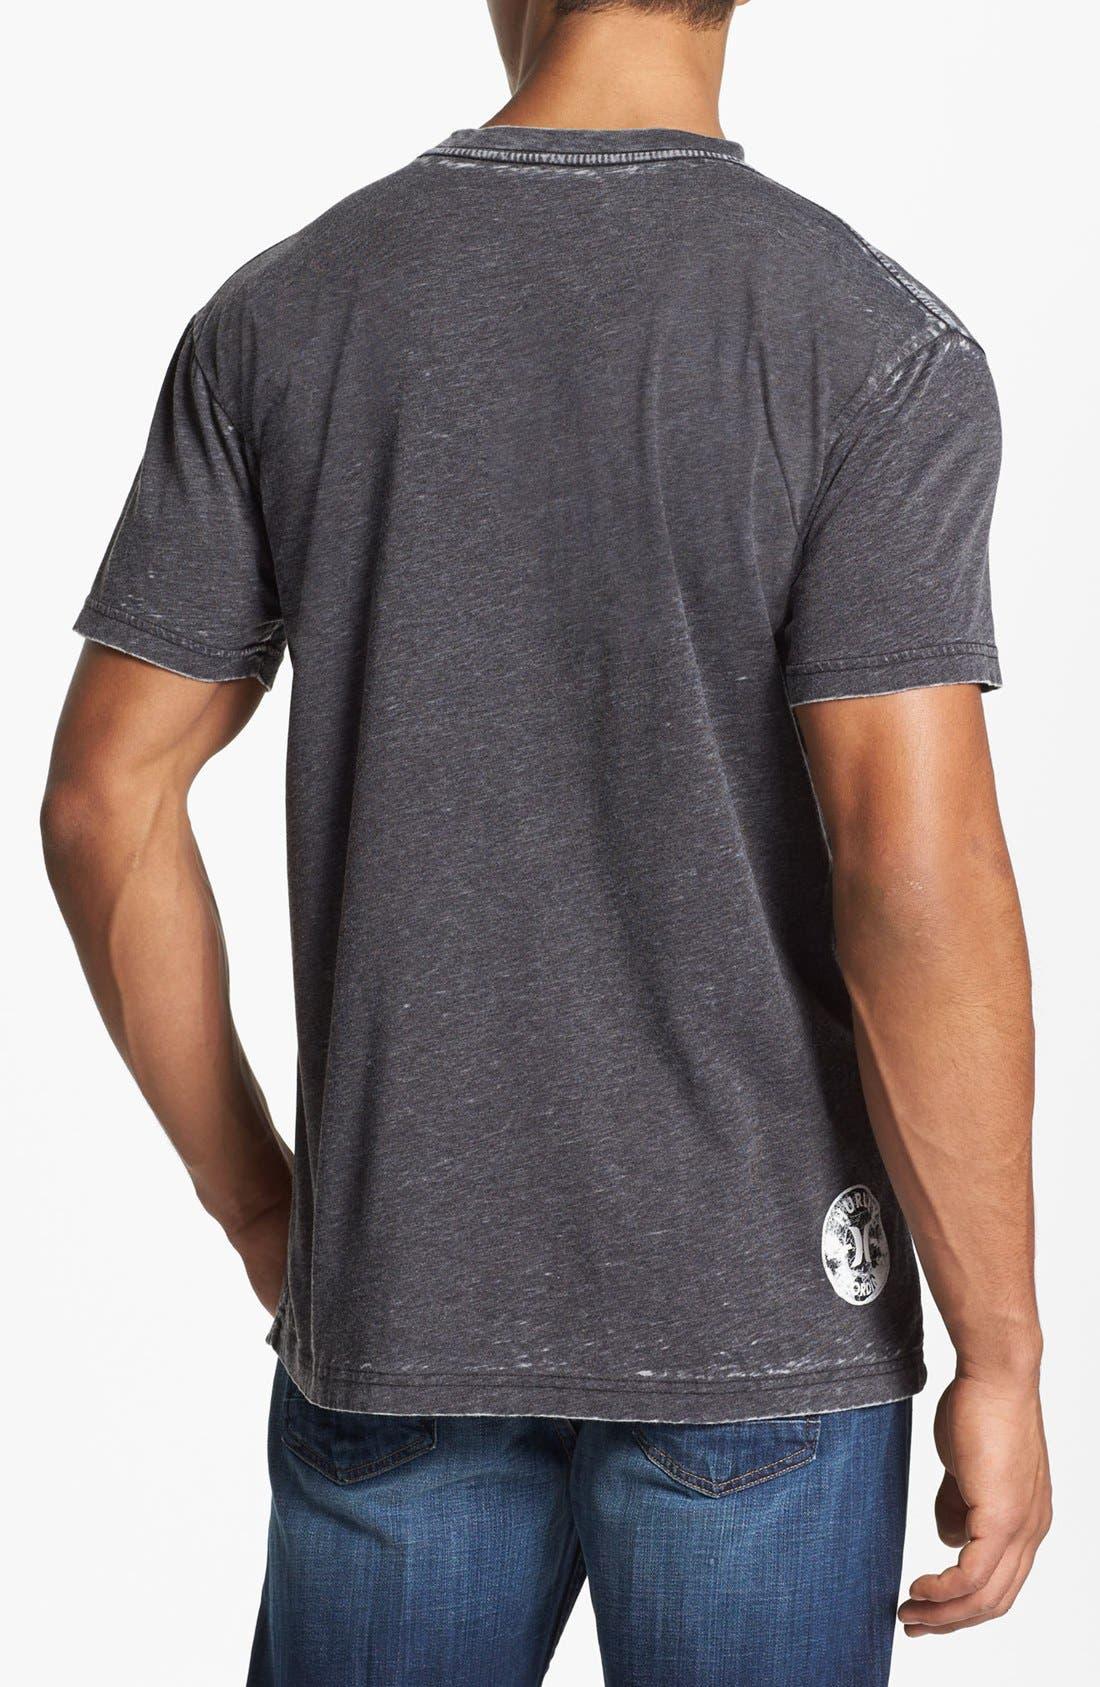 Alternate Image 2  - Hurley 'Guitar Stack' Graphic T-Shirt